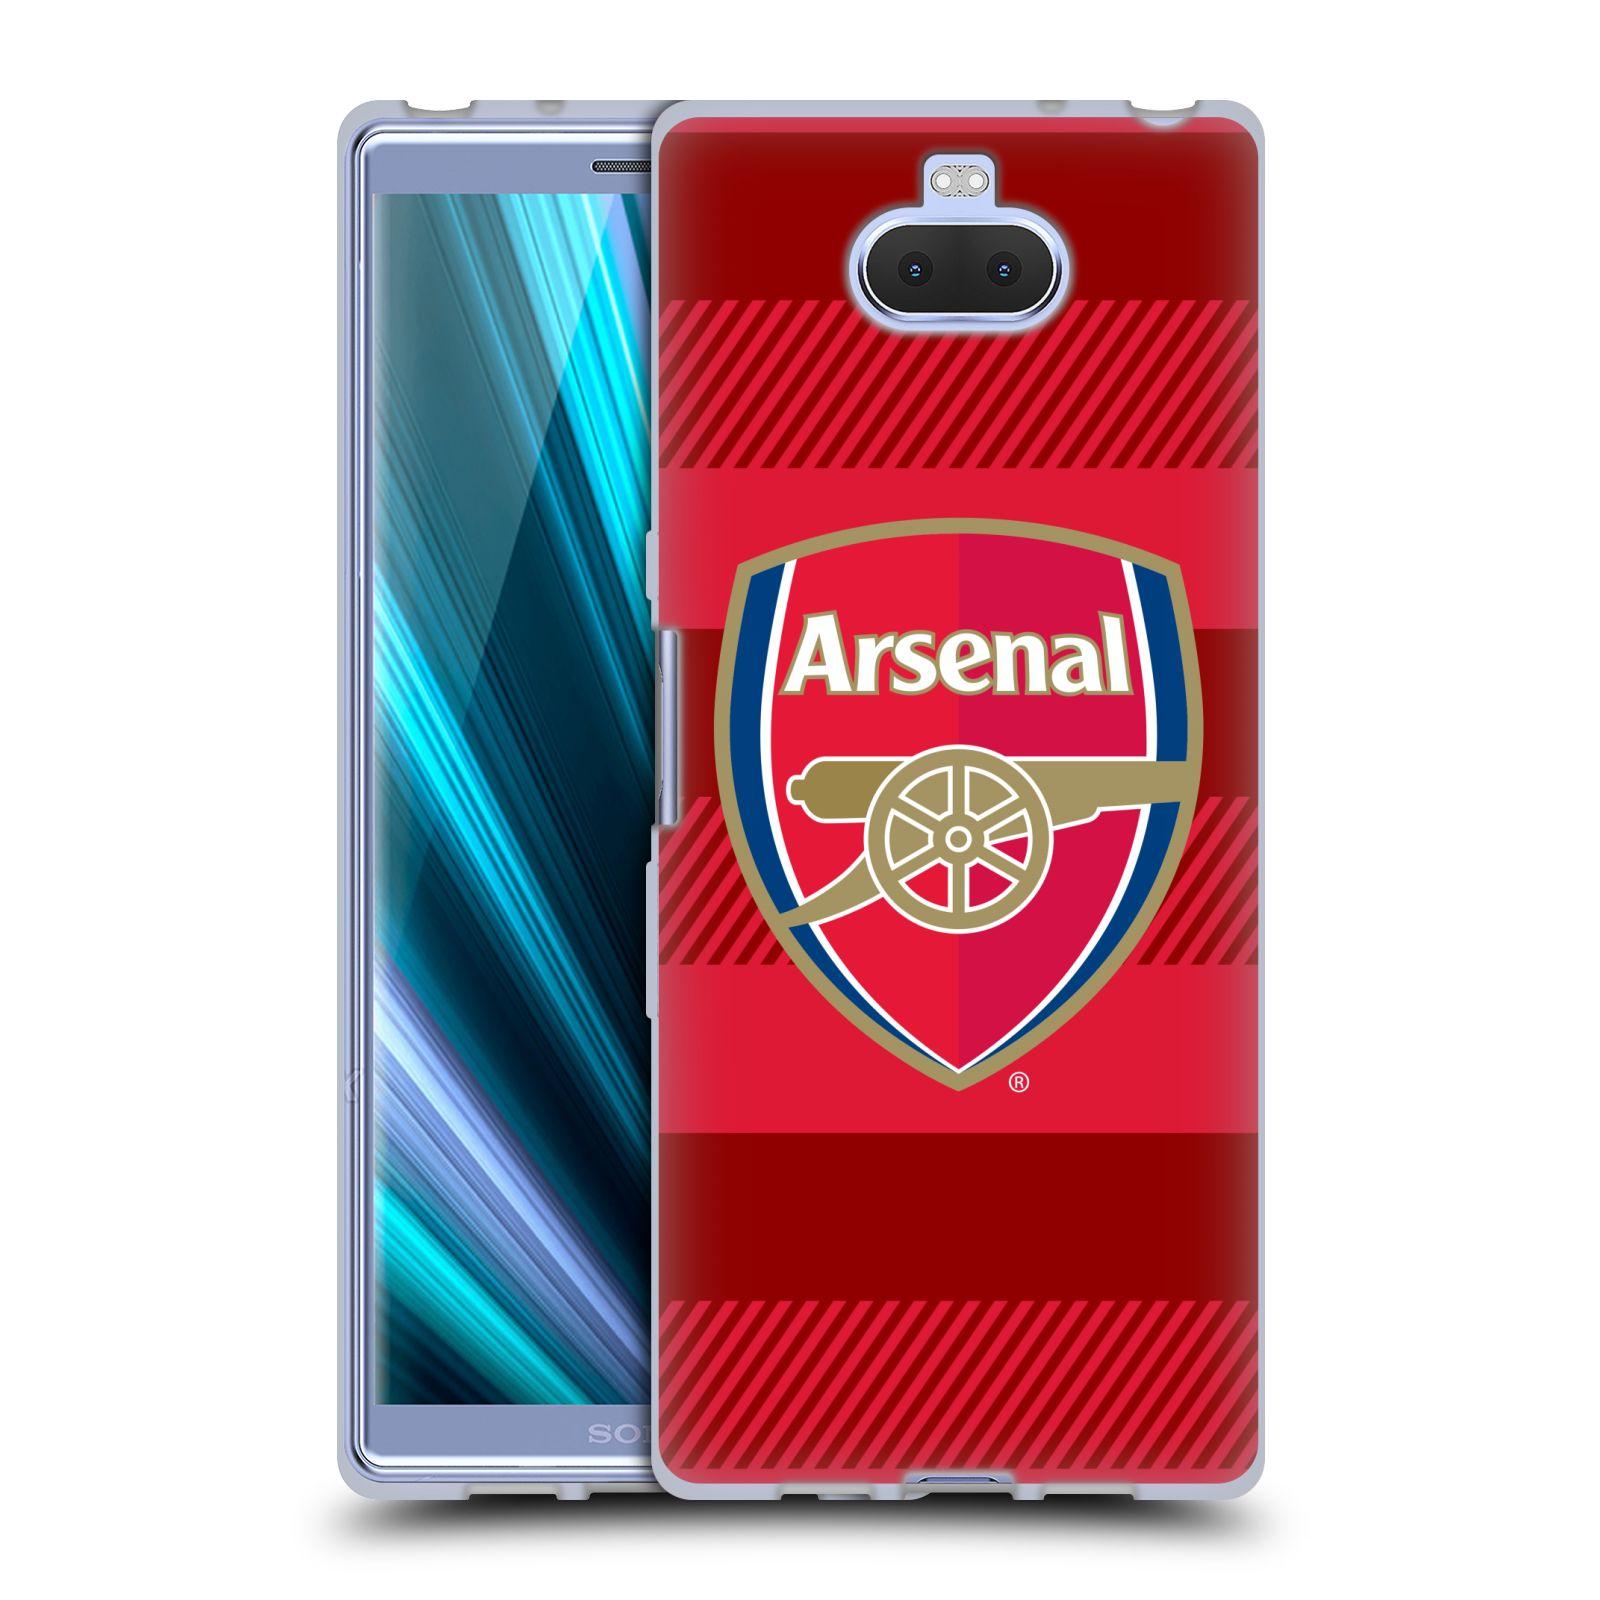 Silikonové pouzdro na mobil Sony Xperia 10 - Head Case - Arsenal FC - Logo s pruhy